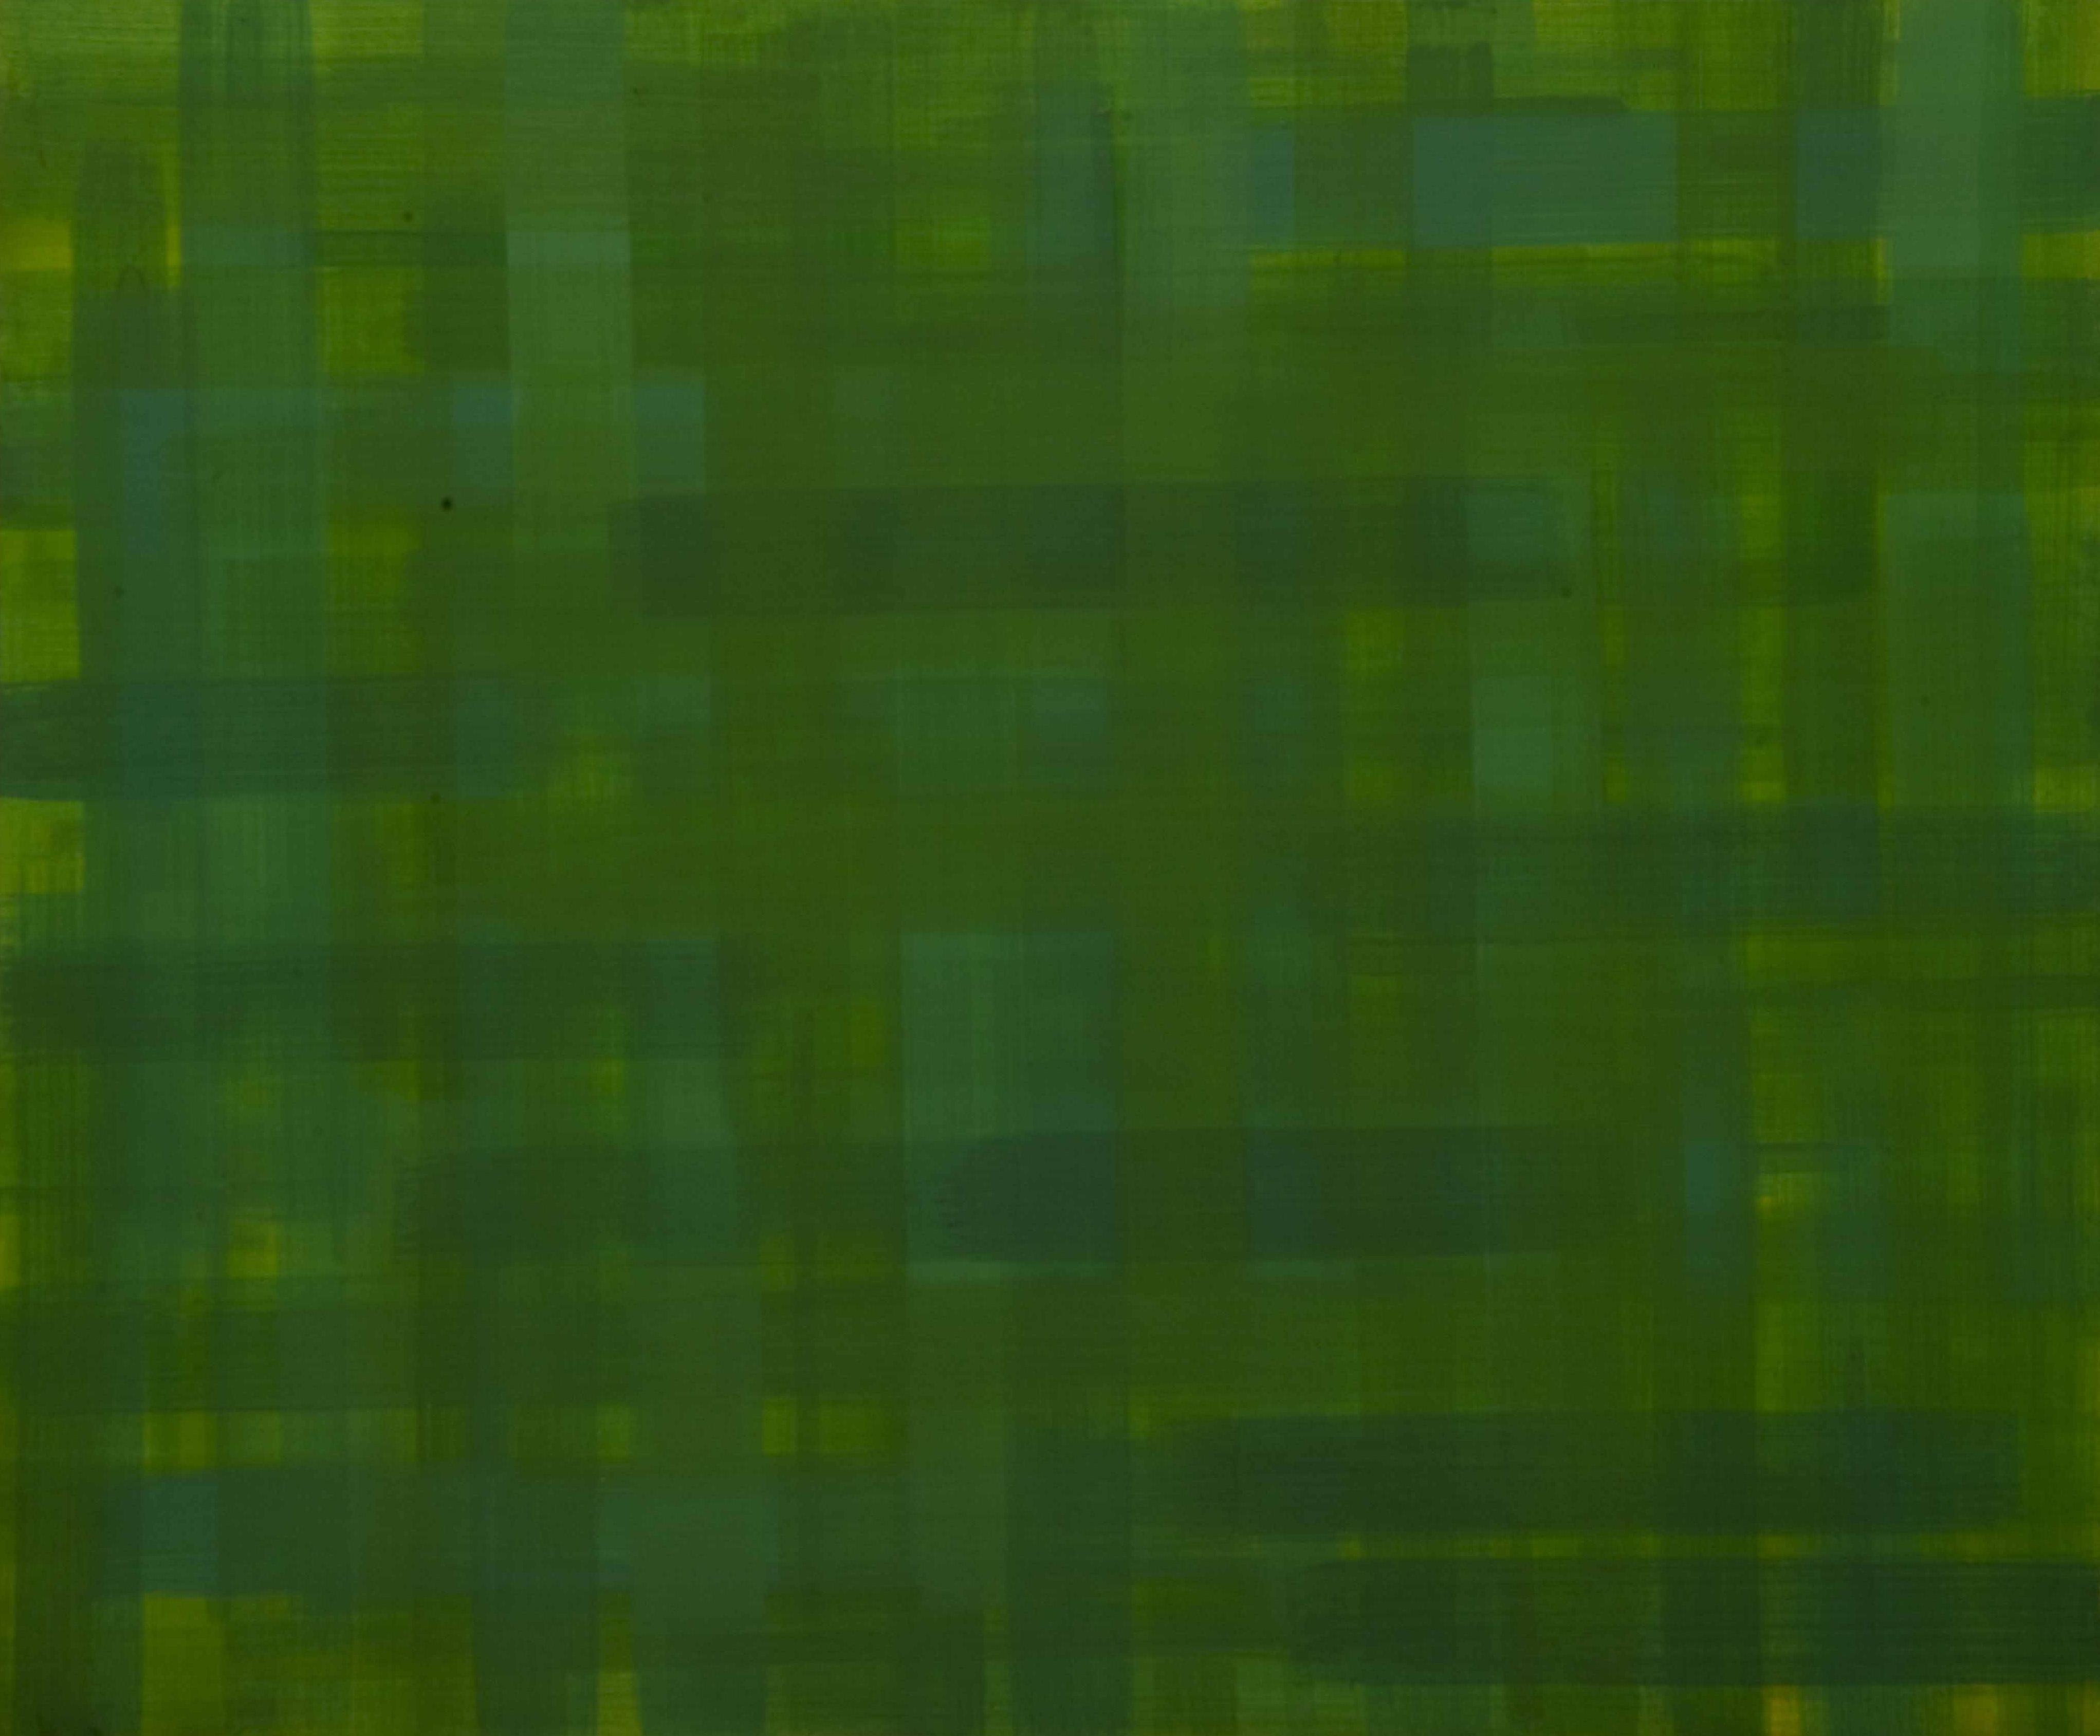 AMRF_0142-64